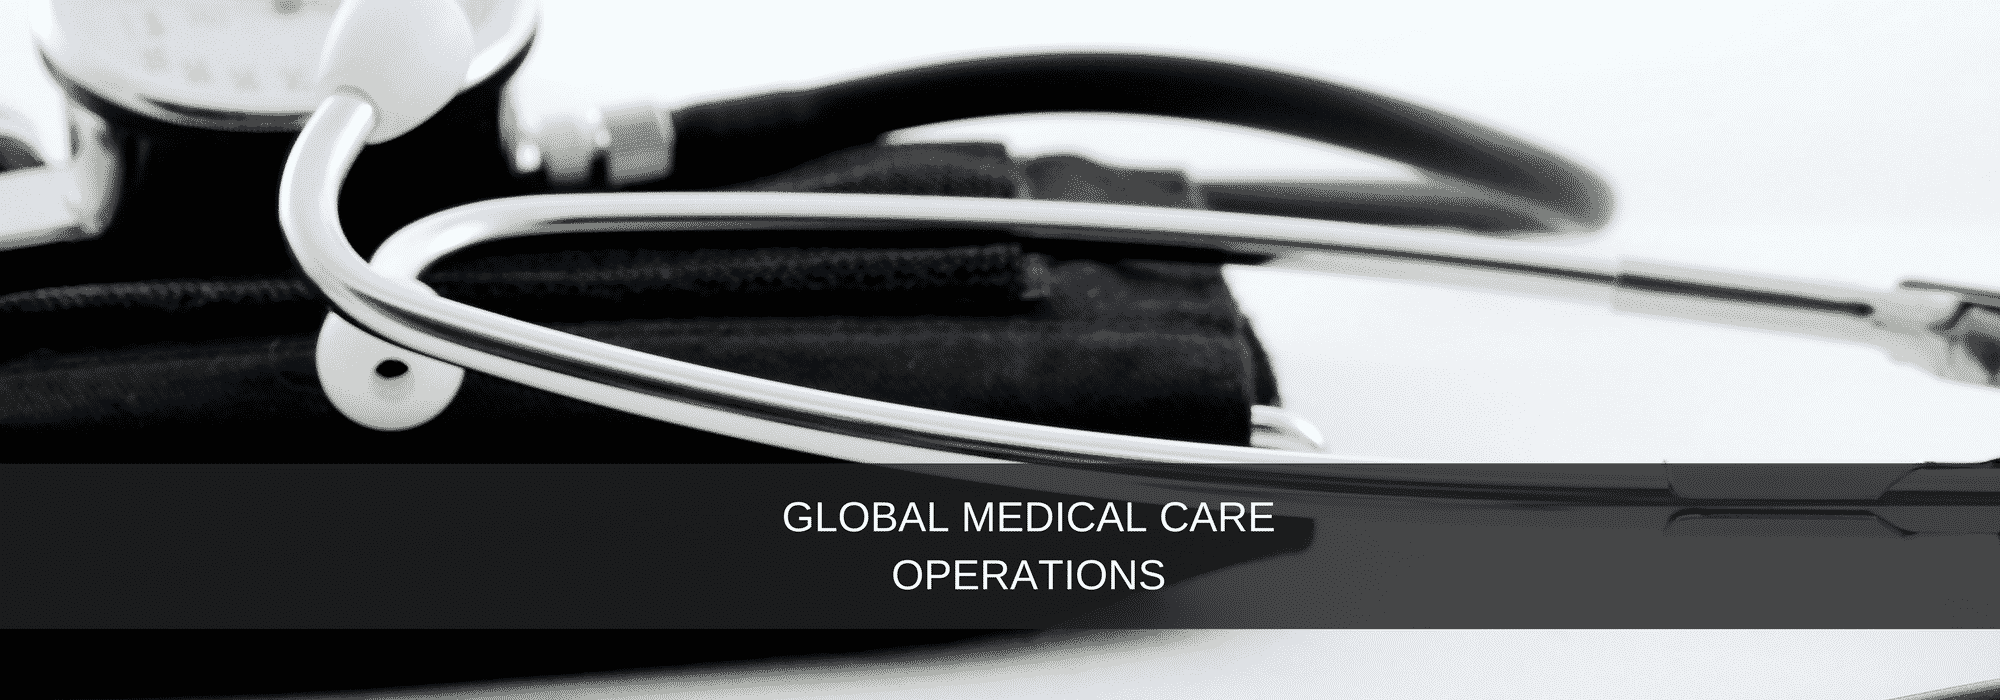 Global Medical Care Operations FAQ - Global Medical Care